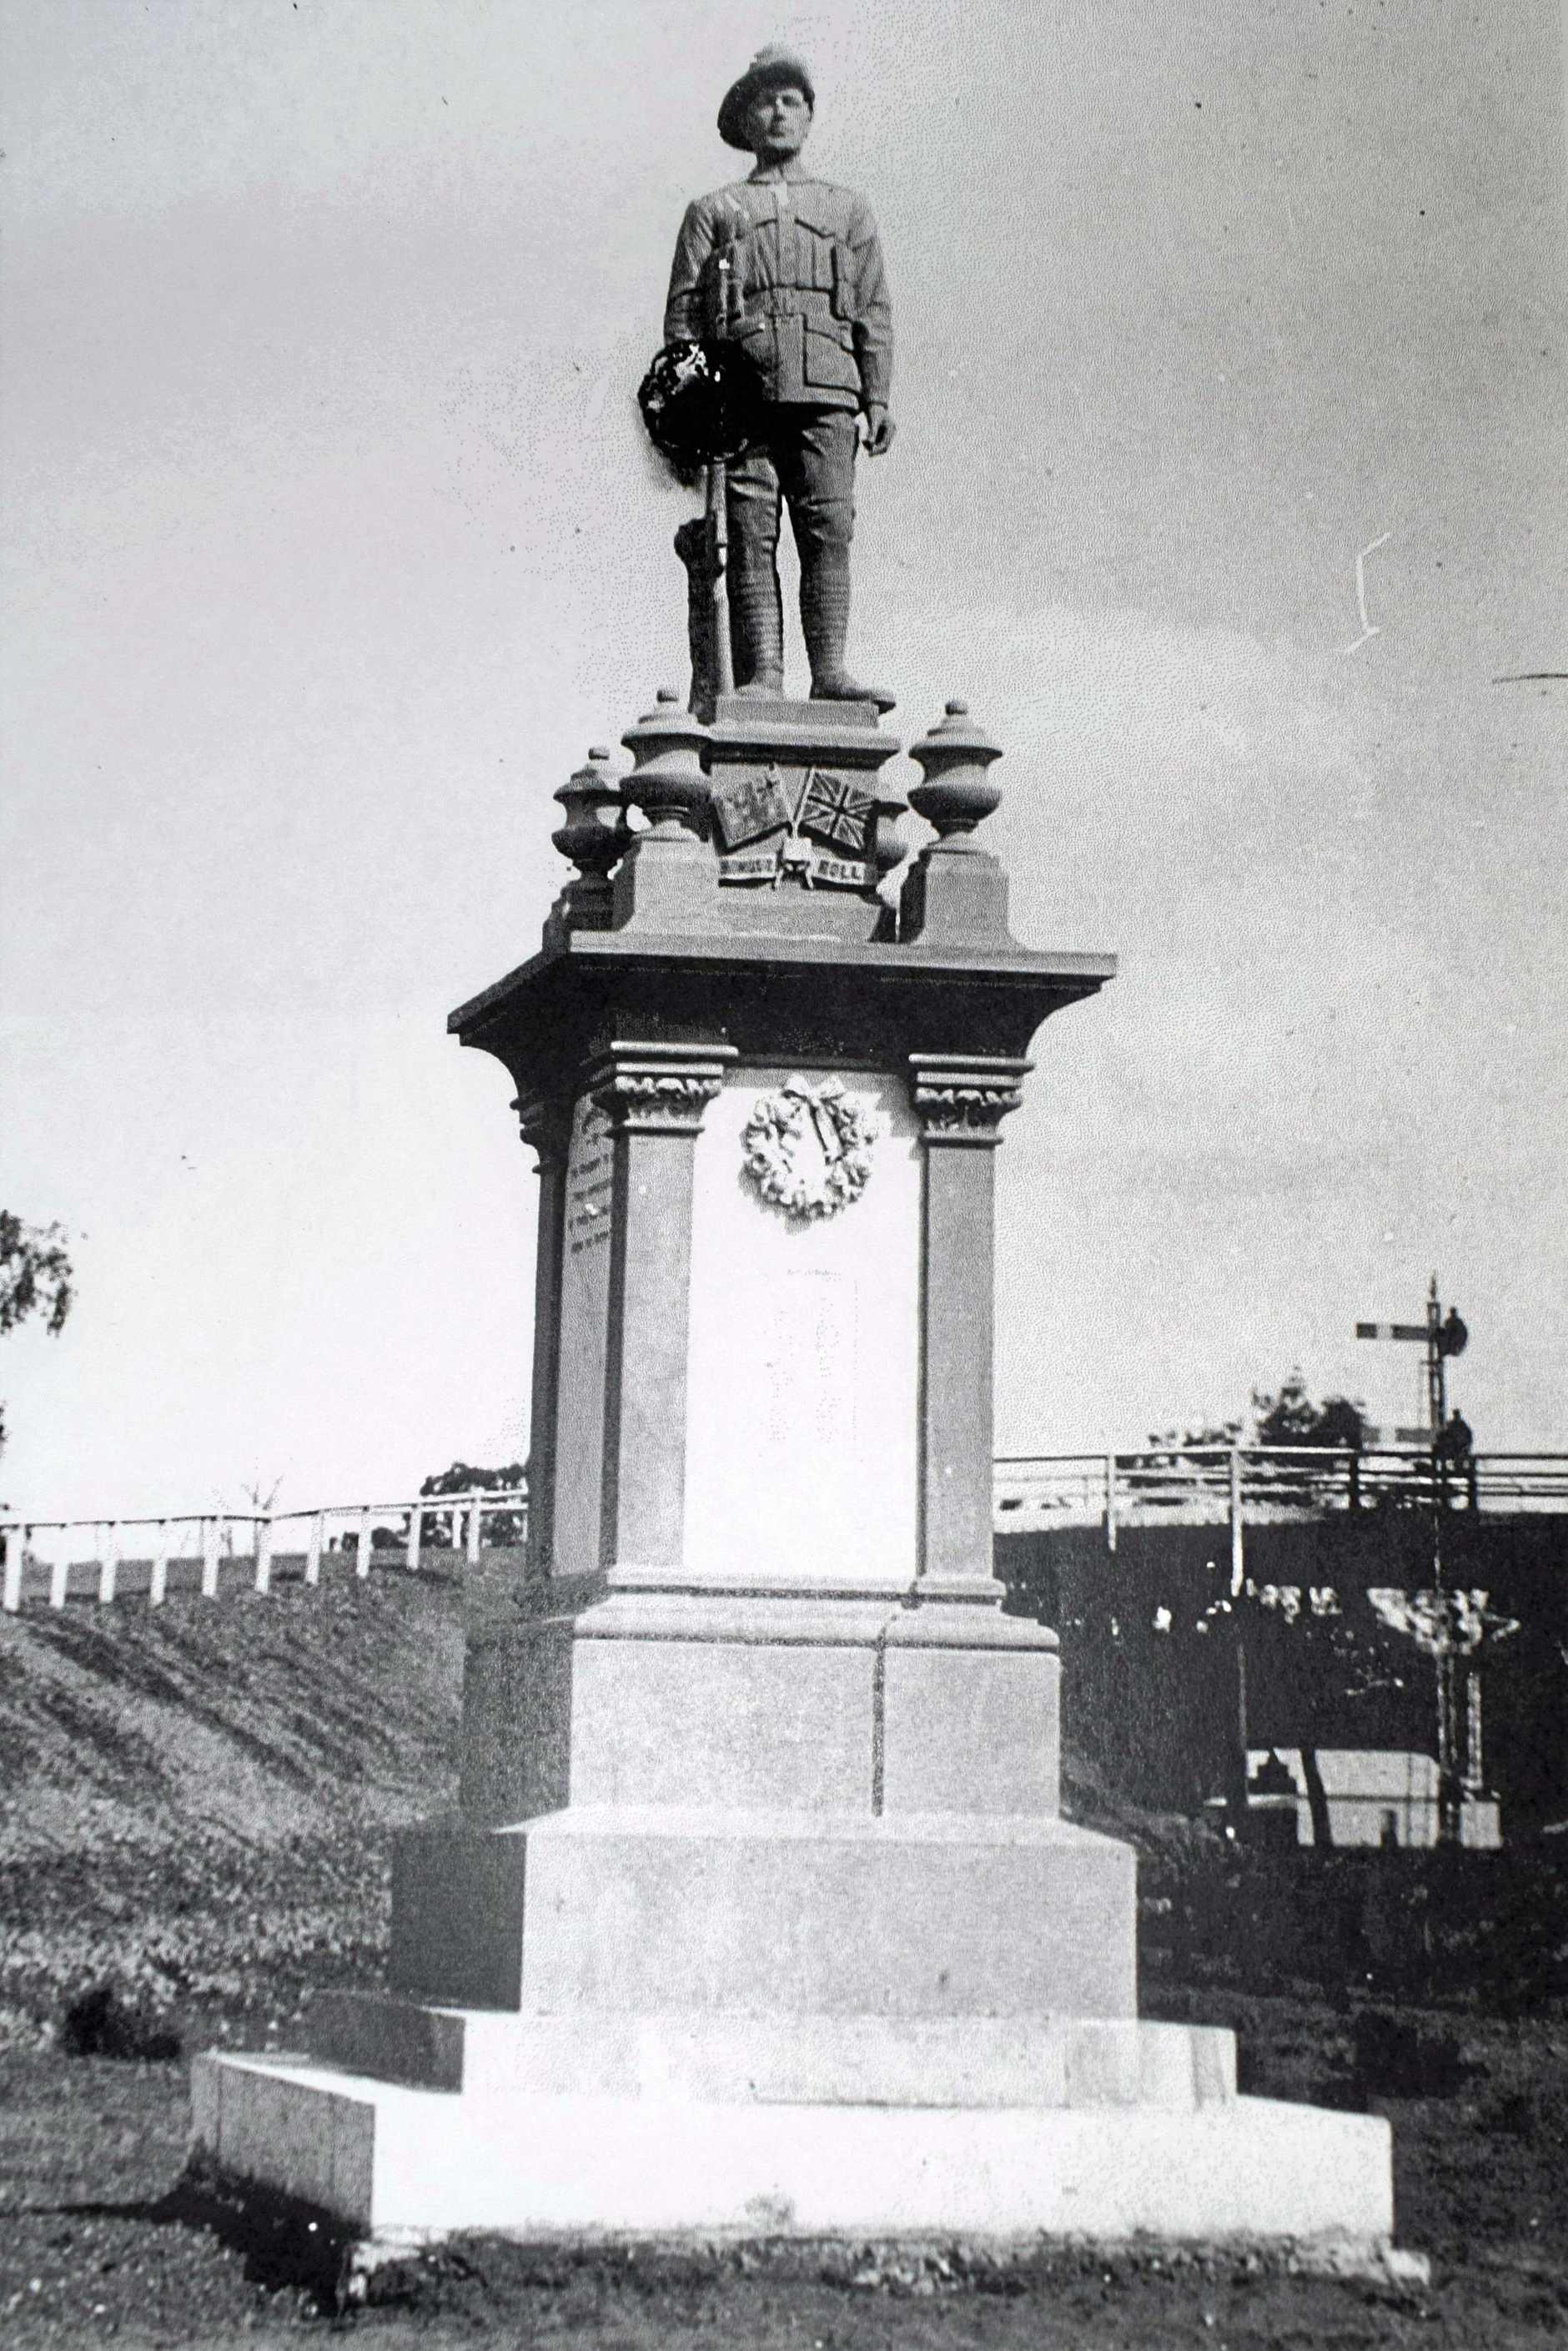 The original Chinchilla Soldier's Memorial on Chinchilla Street, opposite Ainsworth Motors.